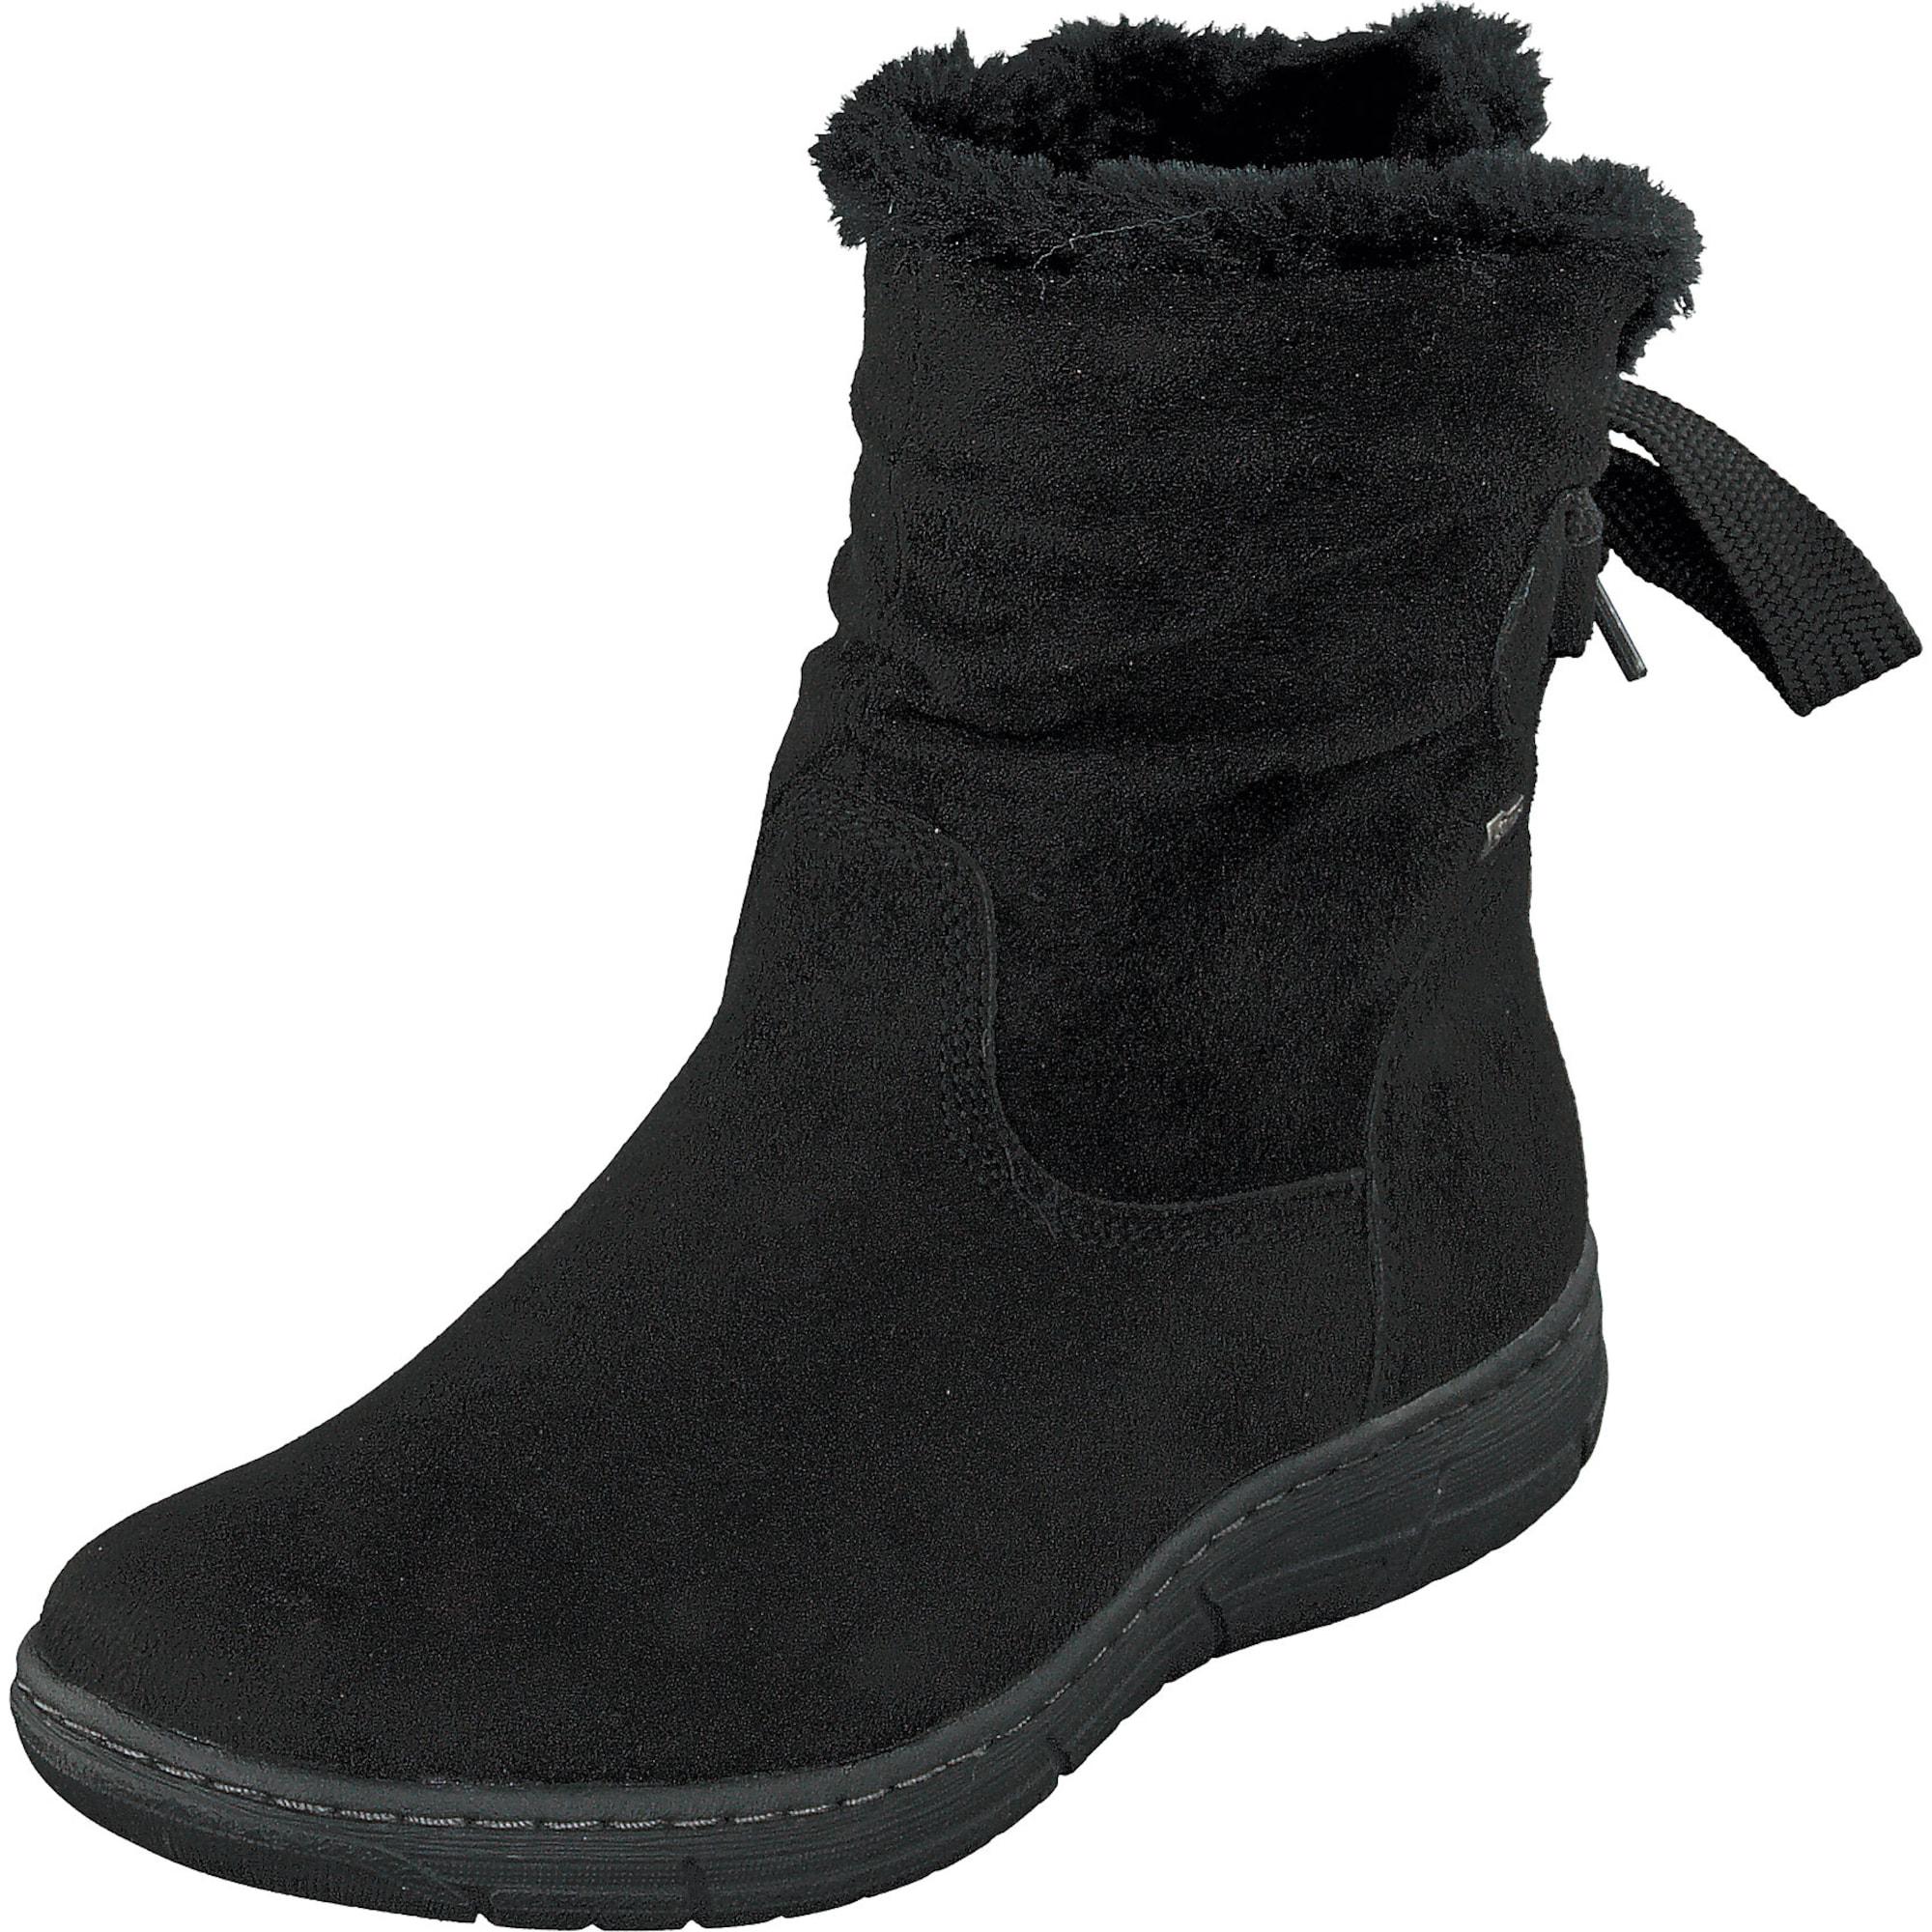 Winterstiefeletten   Schuhe > Stiefeletten > Winterstiefeletten   Schwarz   Relife